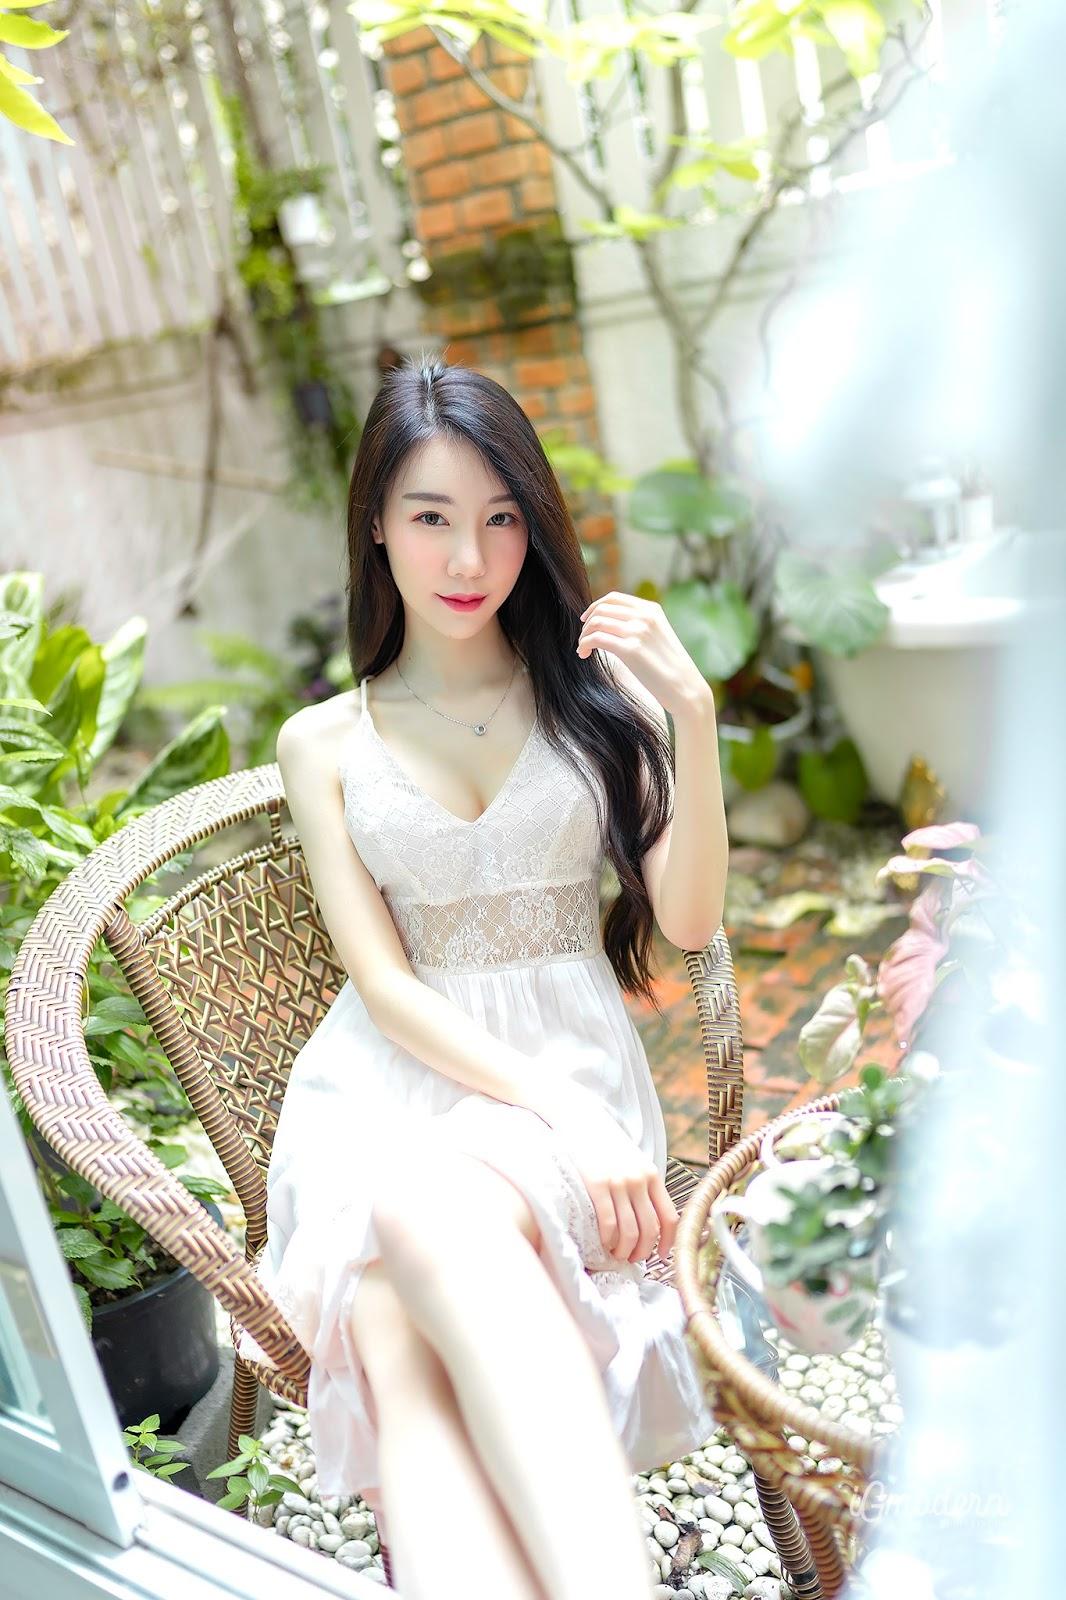 Thailand Beautyful Girl Pic No.271 ||  Carolis Mok